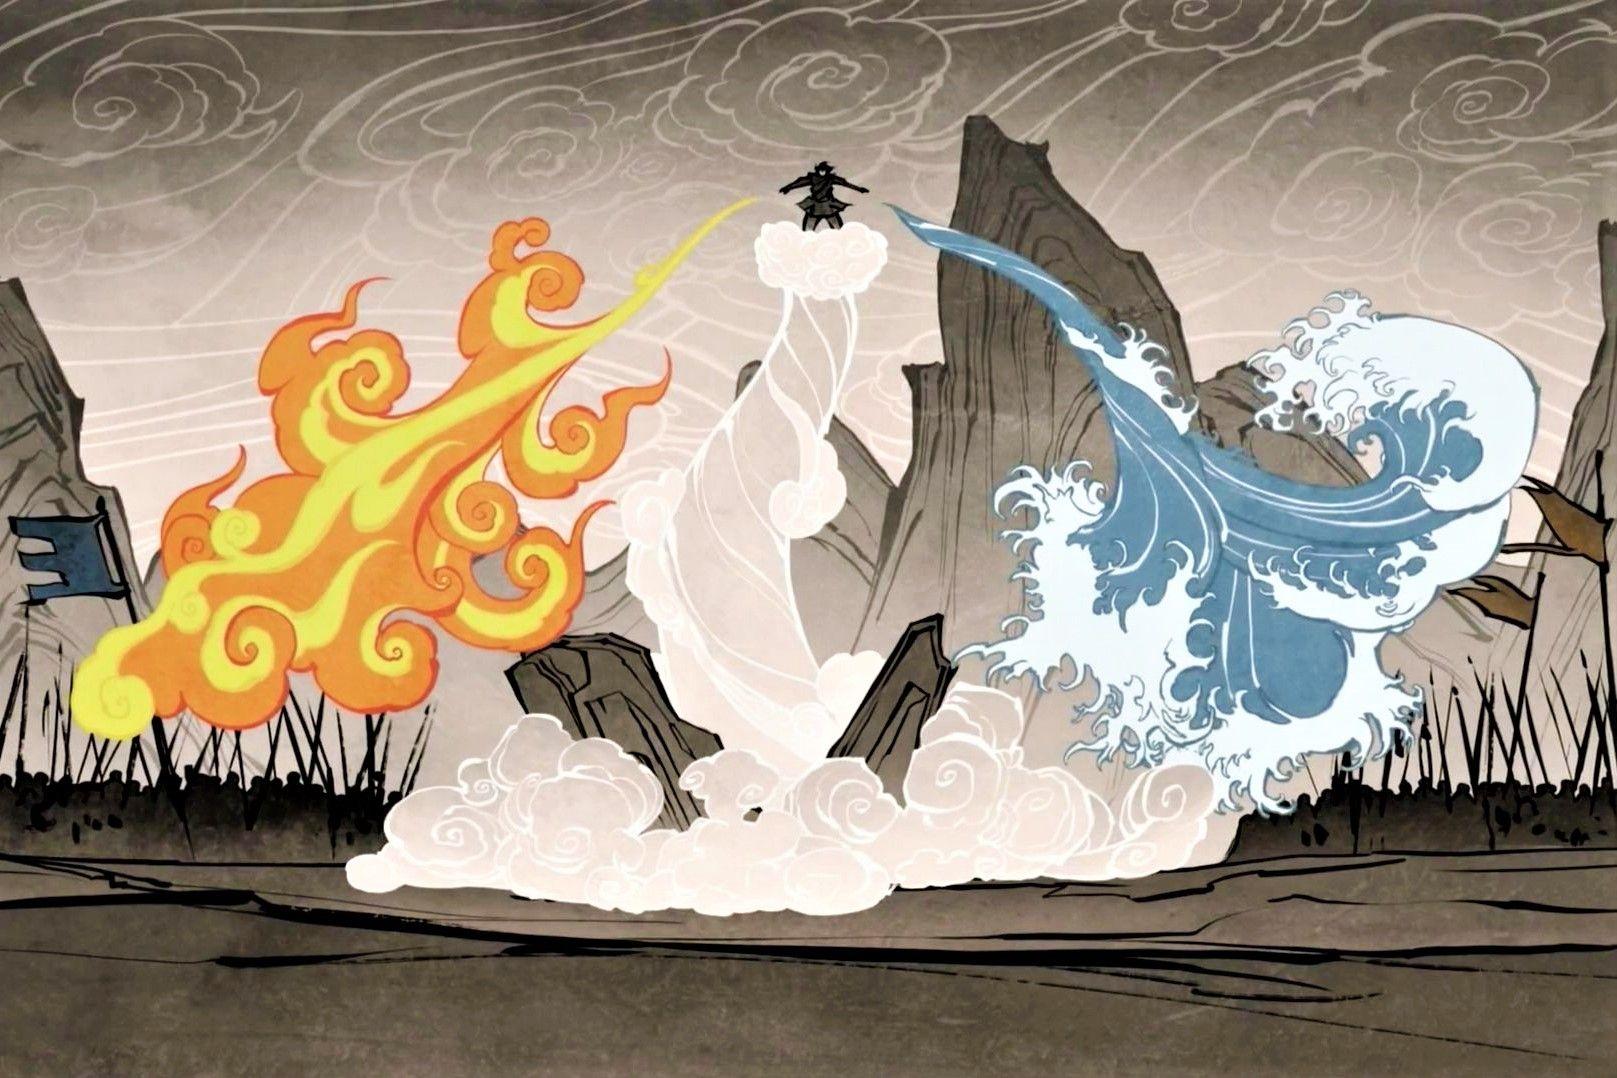 6 Dollar Sticker Sets 5 Avatar The Last Airbender Waterproof 2 Glossy Stickers Ebay Avatar The Last Airbender The Last Airbender Avatar The Last Airbender Art